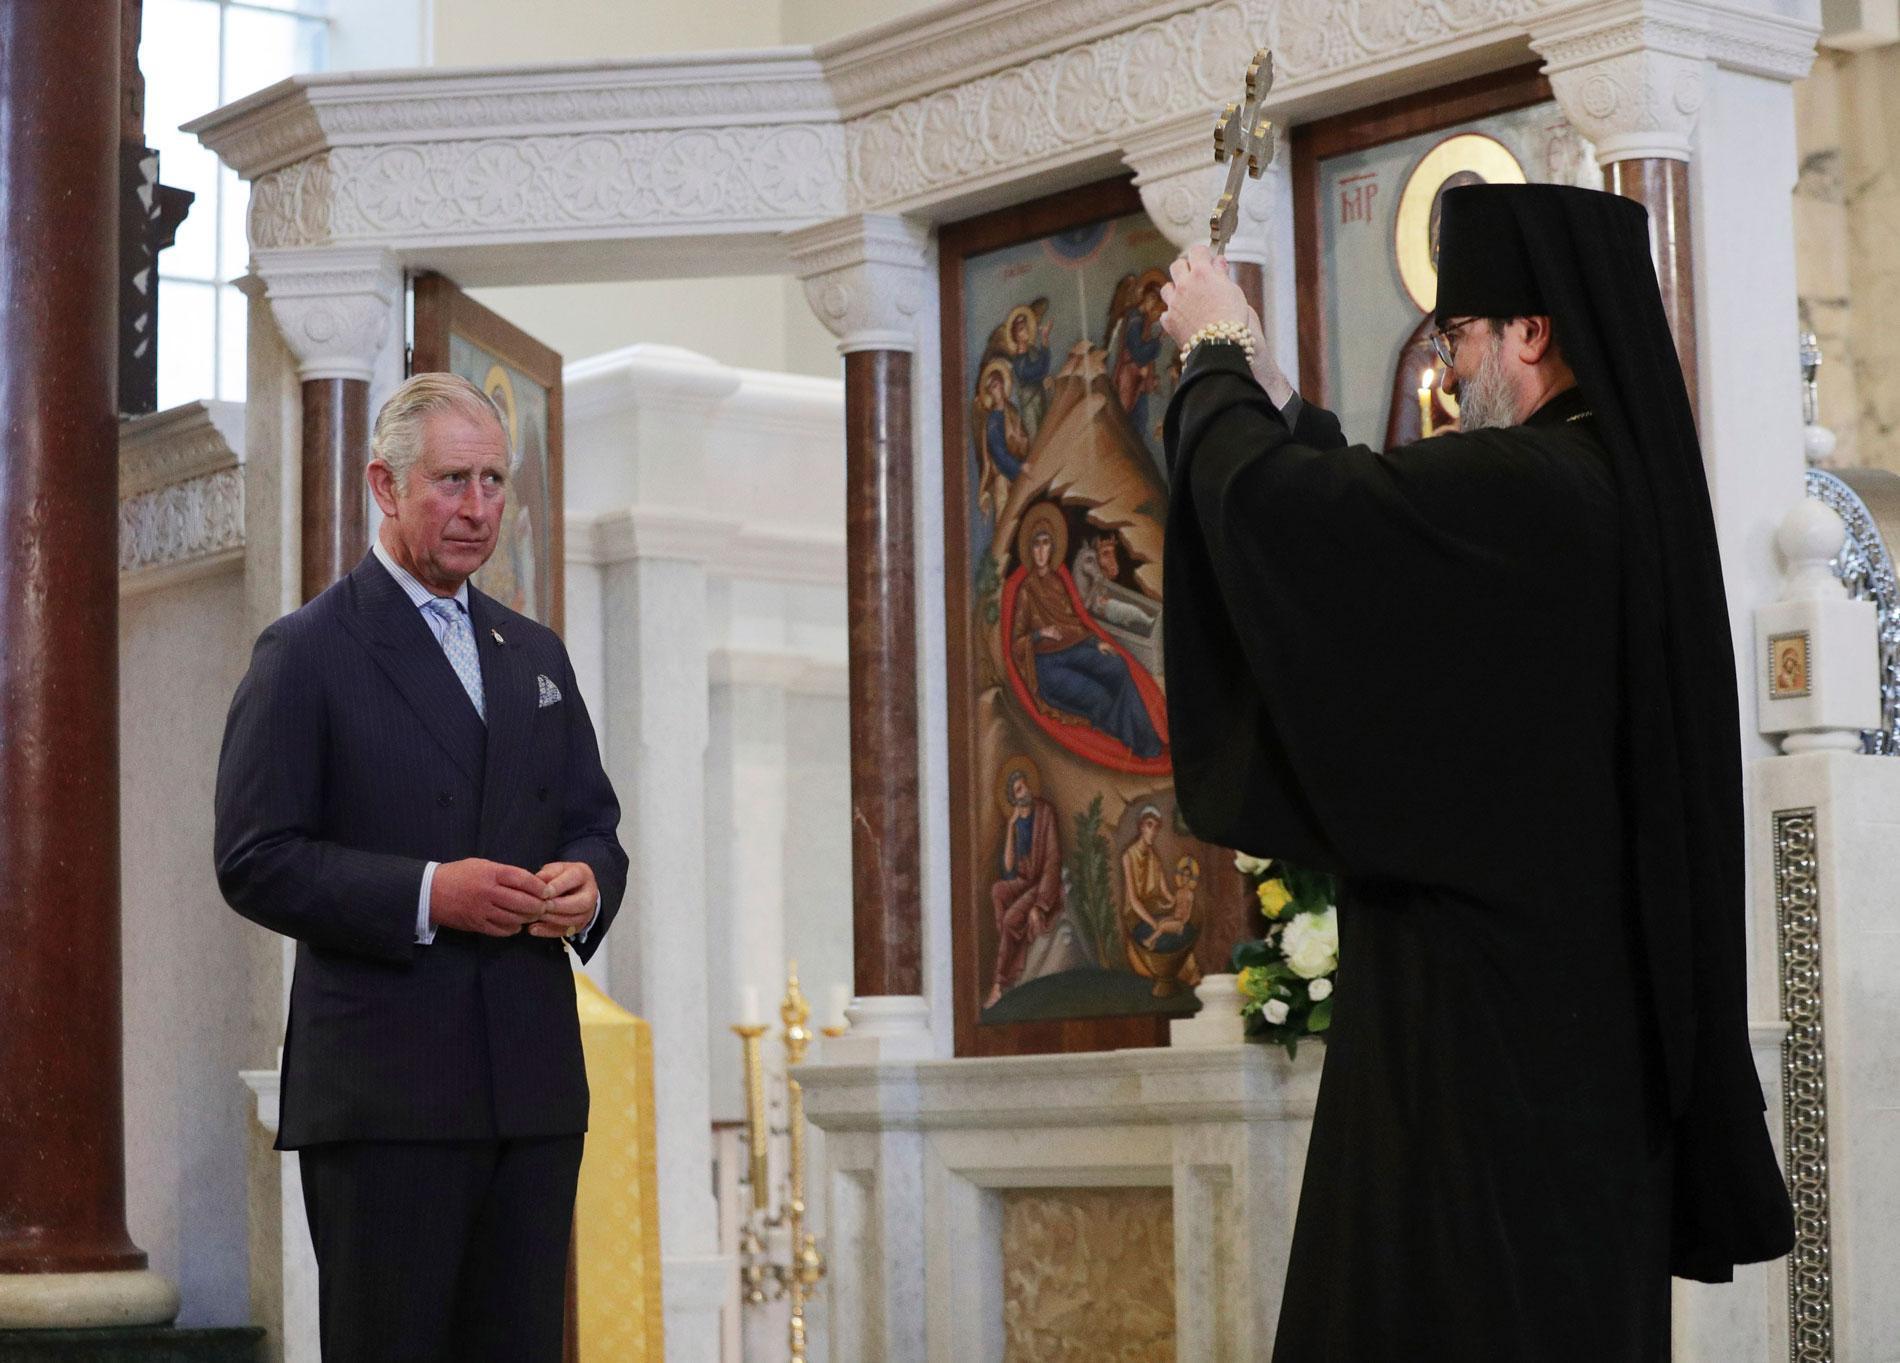 Принц Уэльский Чарльз любит православную веру. Фото ©Yui Mok / Pool Photo via AP